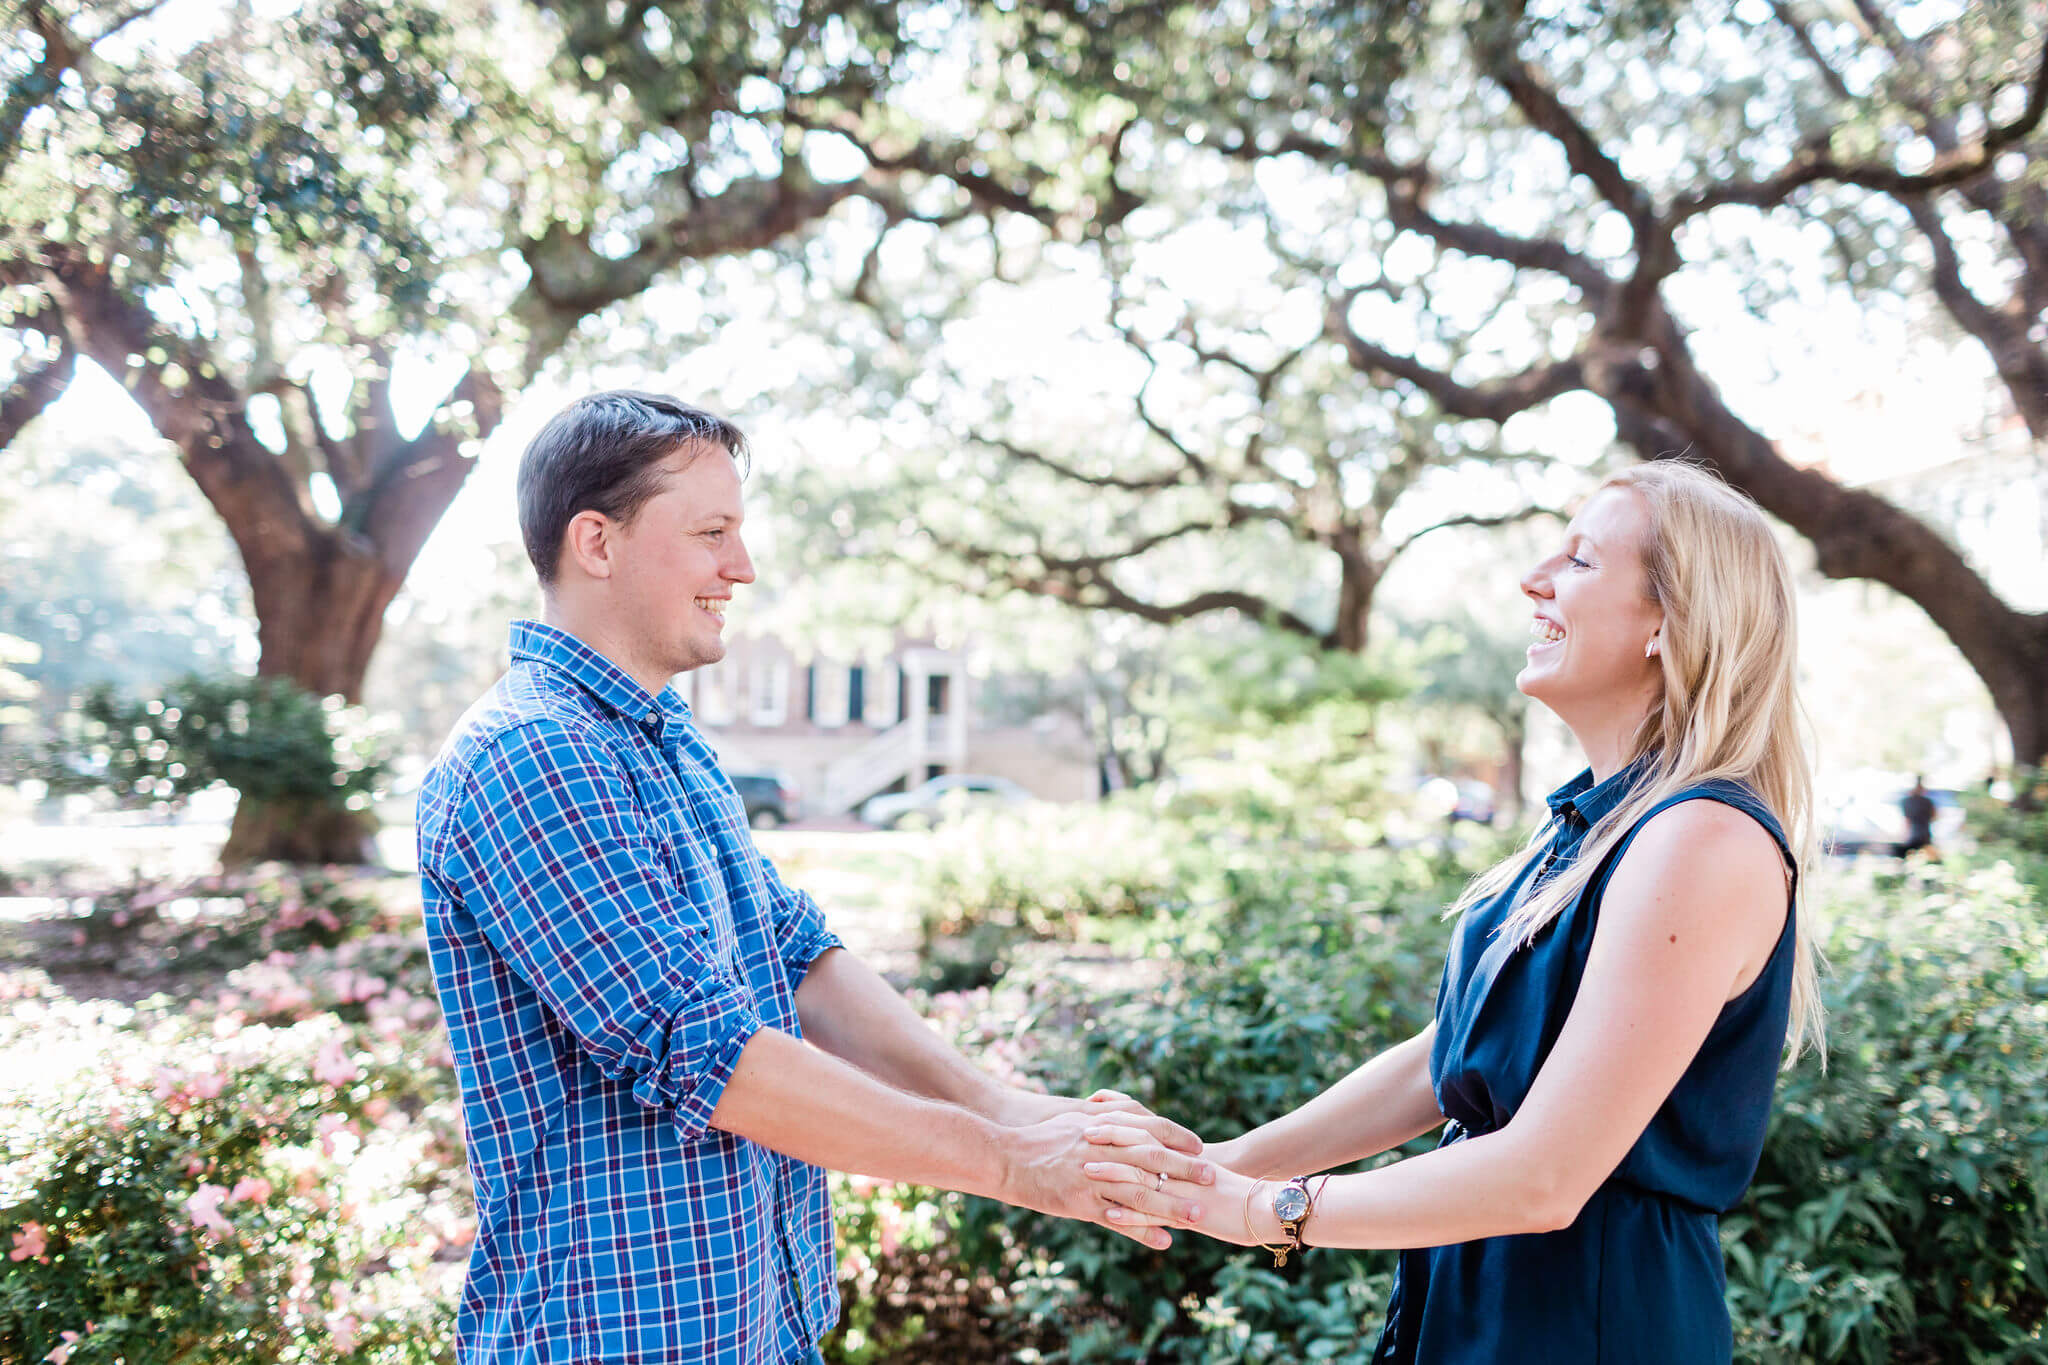 Apt-b-photography-savannah-engagement-photographer-savannah-wedding-hilton-head-elopement-savannah-wedding-photographer-13.jpg